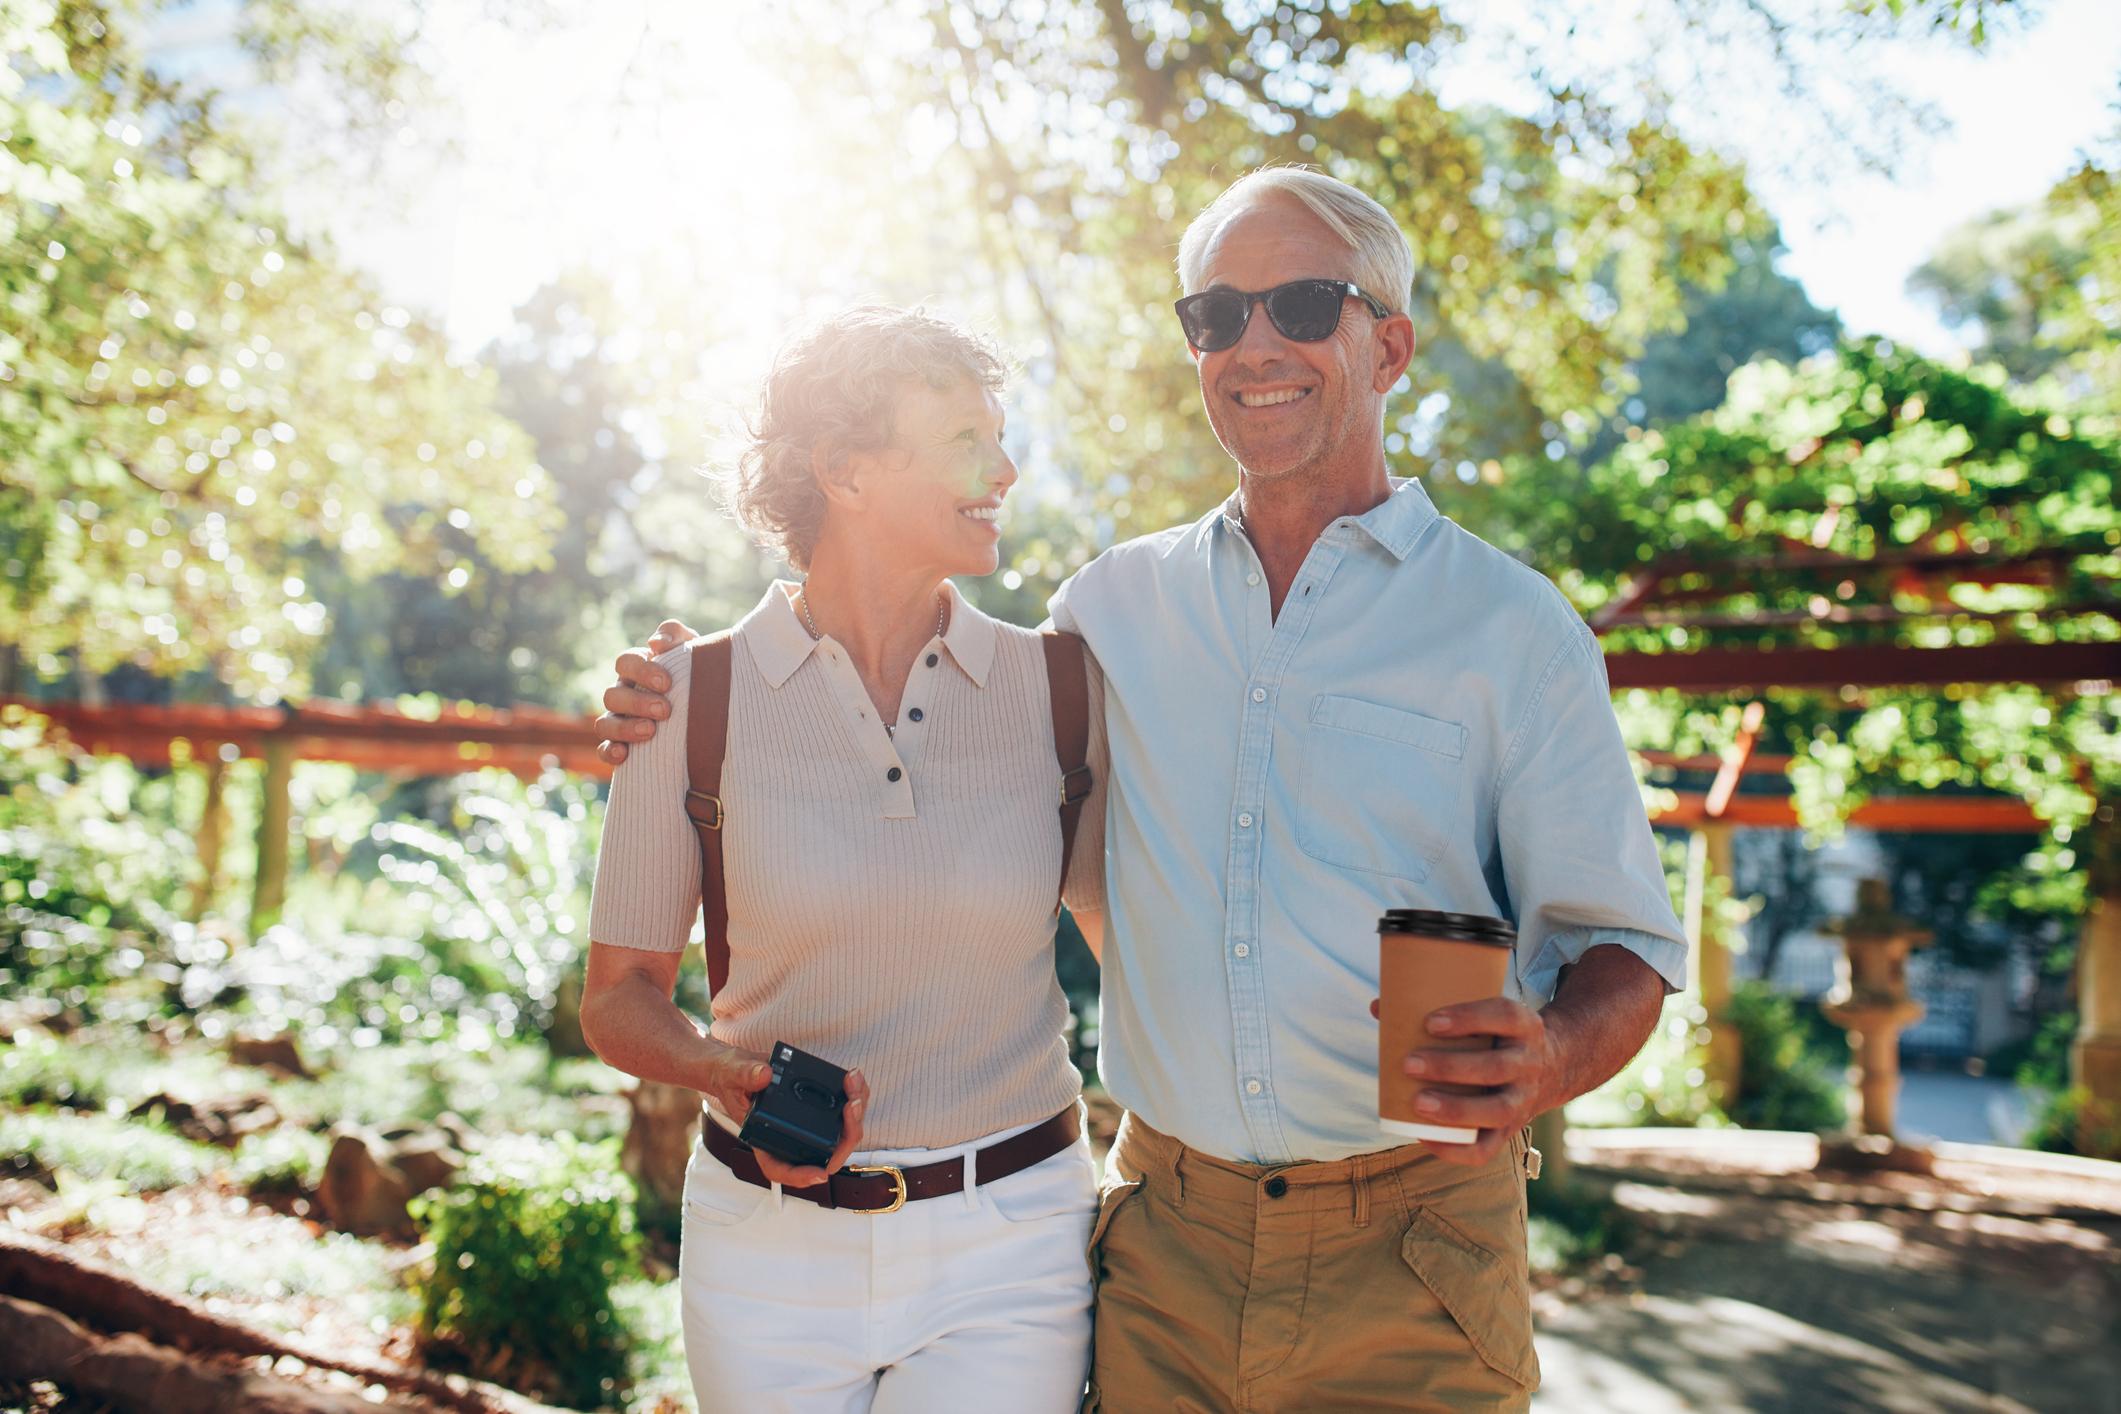 Senior couple outdoors, smiling